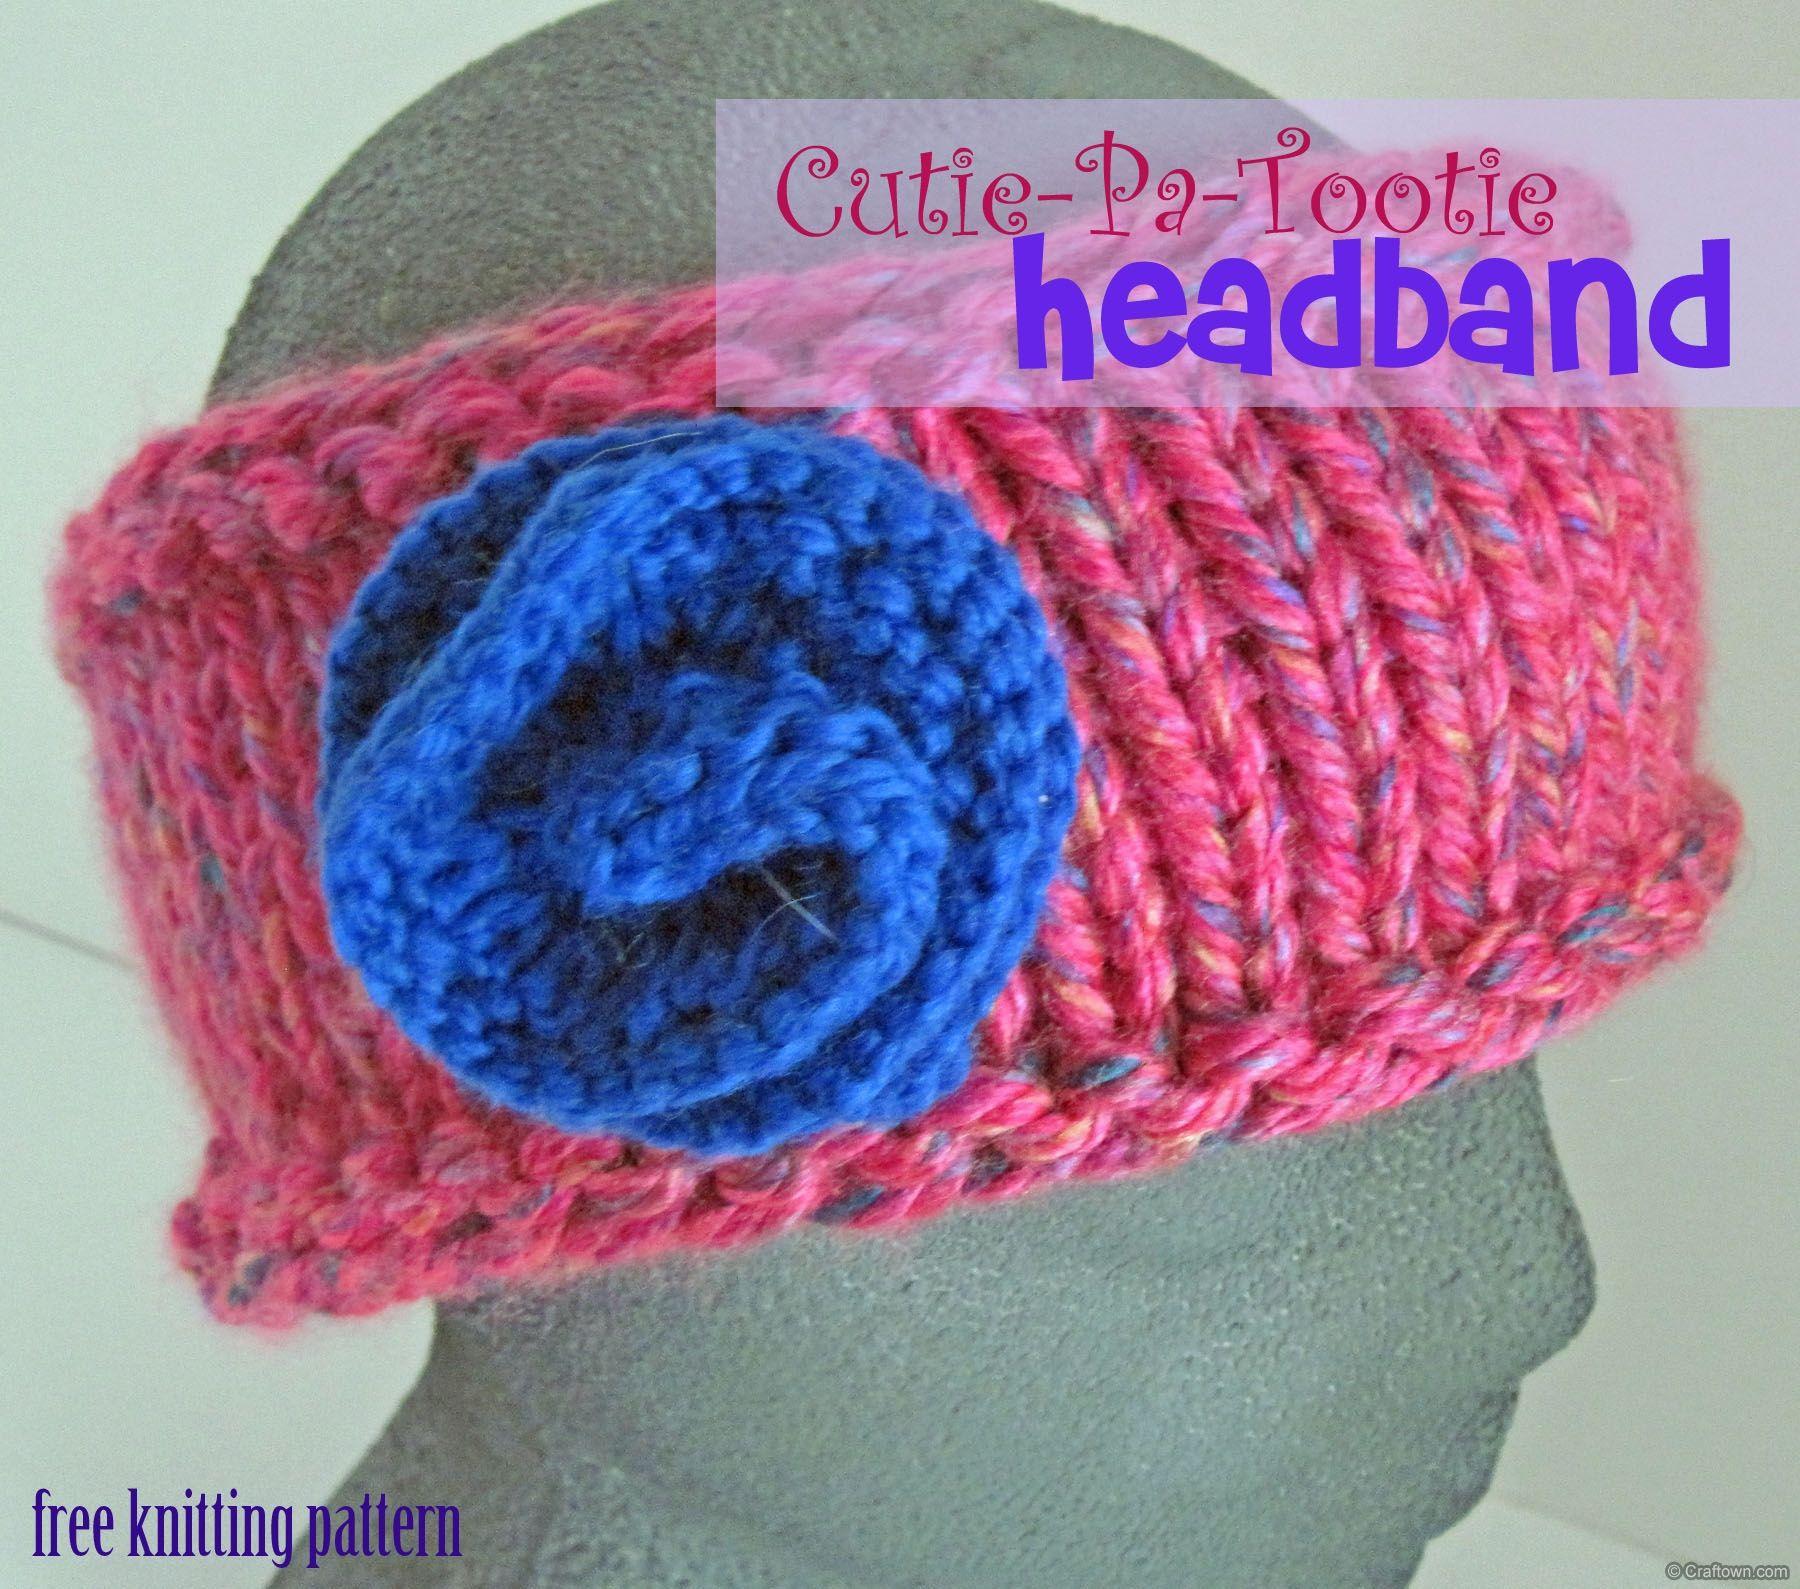 Free knitting pattern cutie patootie headband knit wit free knitting pattern cutie patootie headband bankloansurffo Images